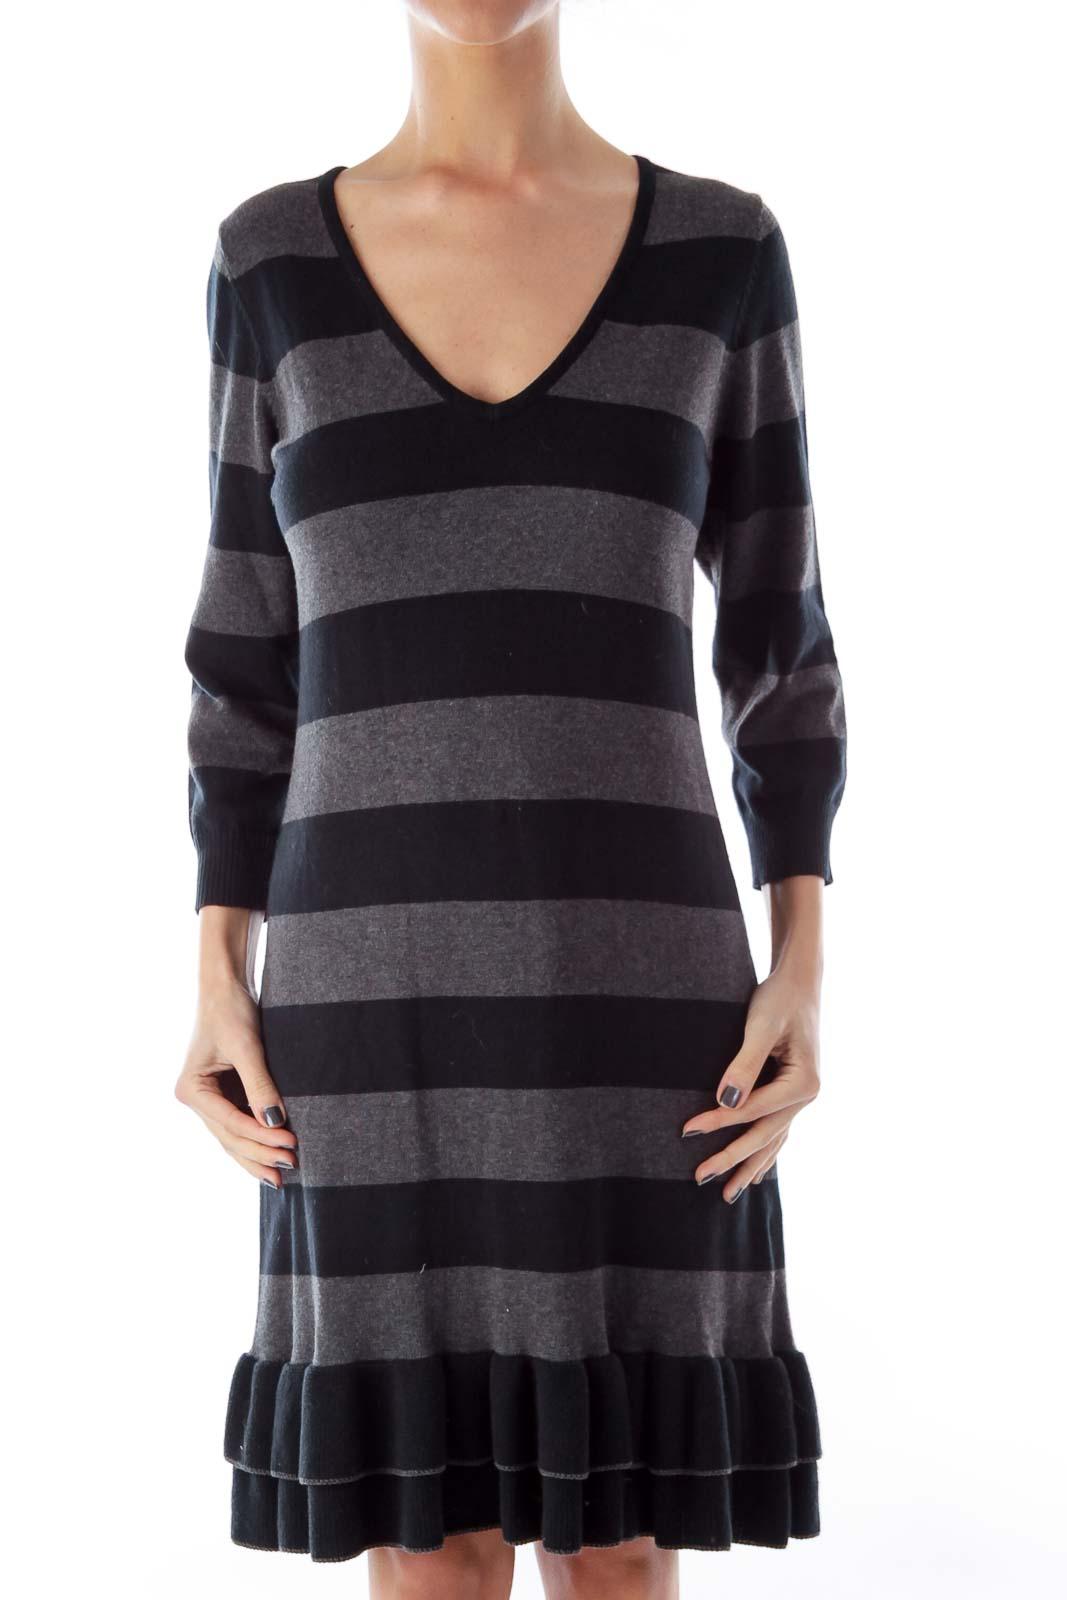 Black & Gray Stripe Knit Dress Front